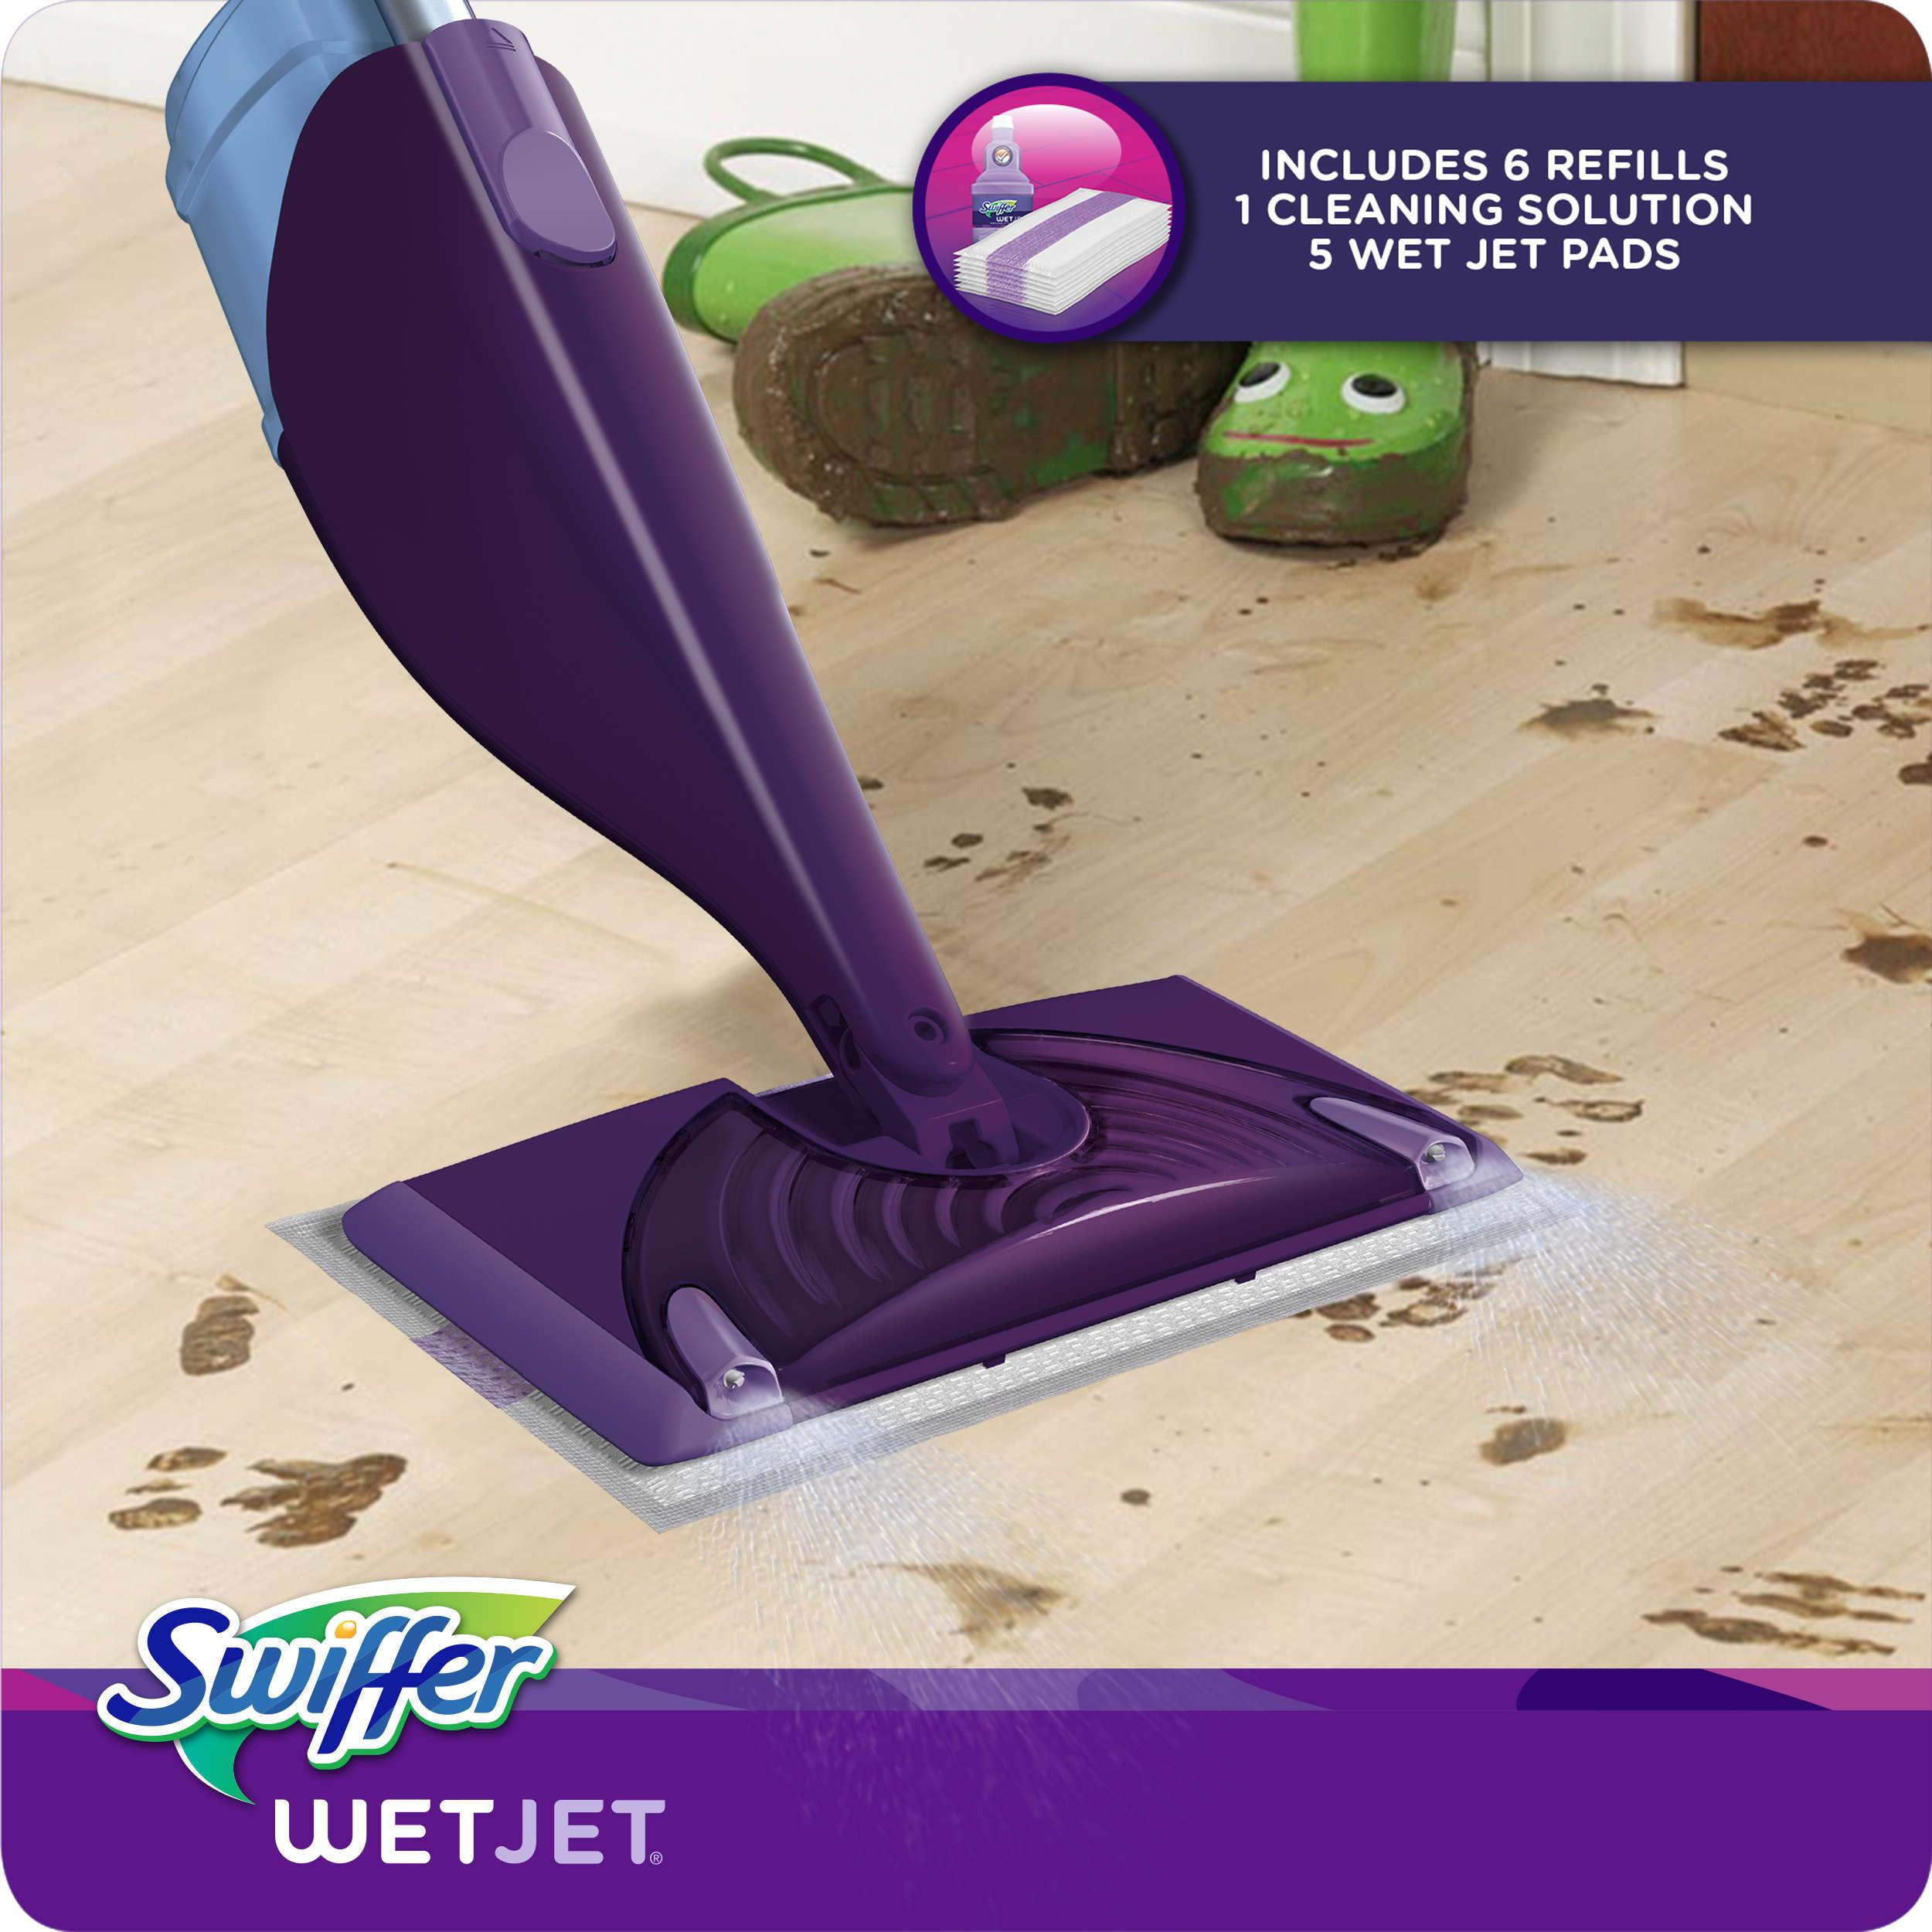 Swiffer wetjet wood floor cleaner - Swiffer Wetjet Wood Floor Cleaner 33